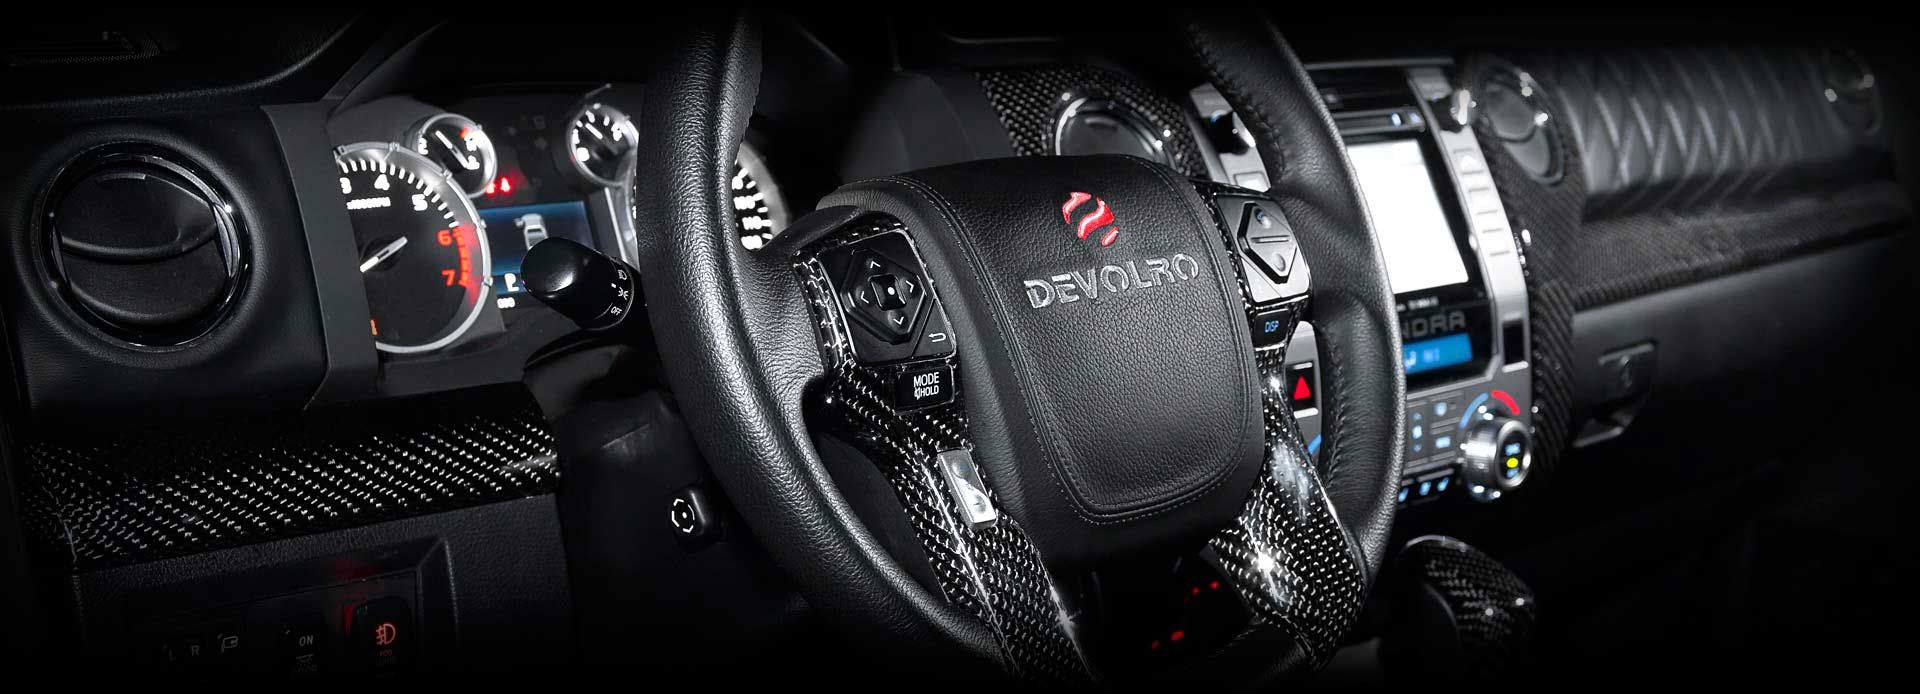 Amazing Custom Interior For Toyota Tundra By Devolro Motors Company Toyota Devolro Pinterest